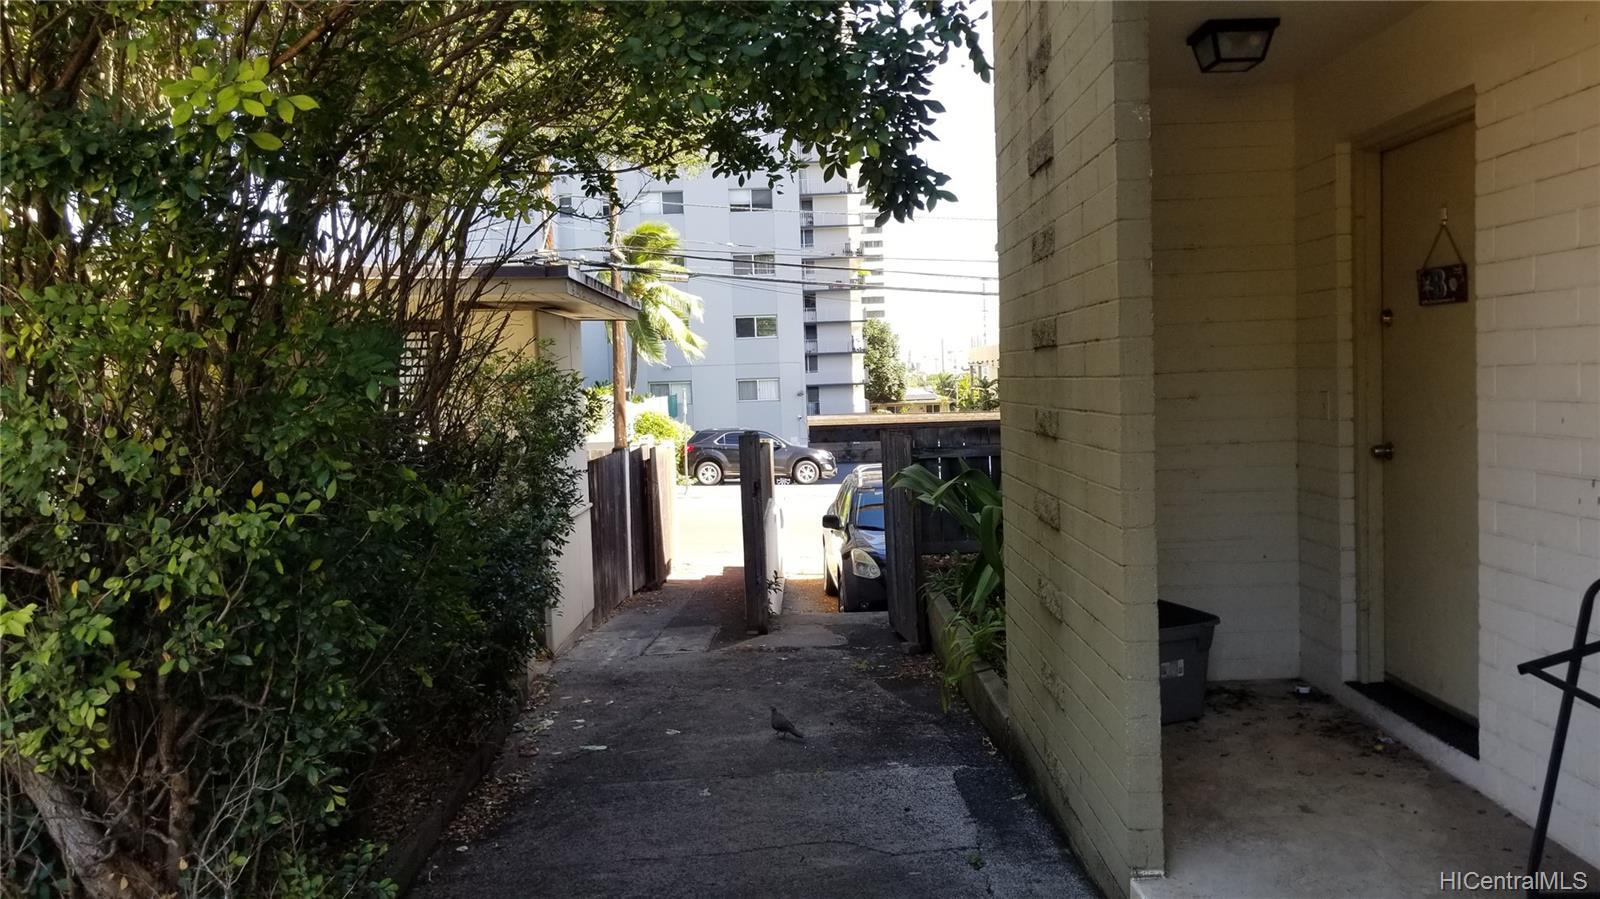 1576 Pensacola Street Honolulu - Multi-family - photo 17 of 20